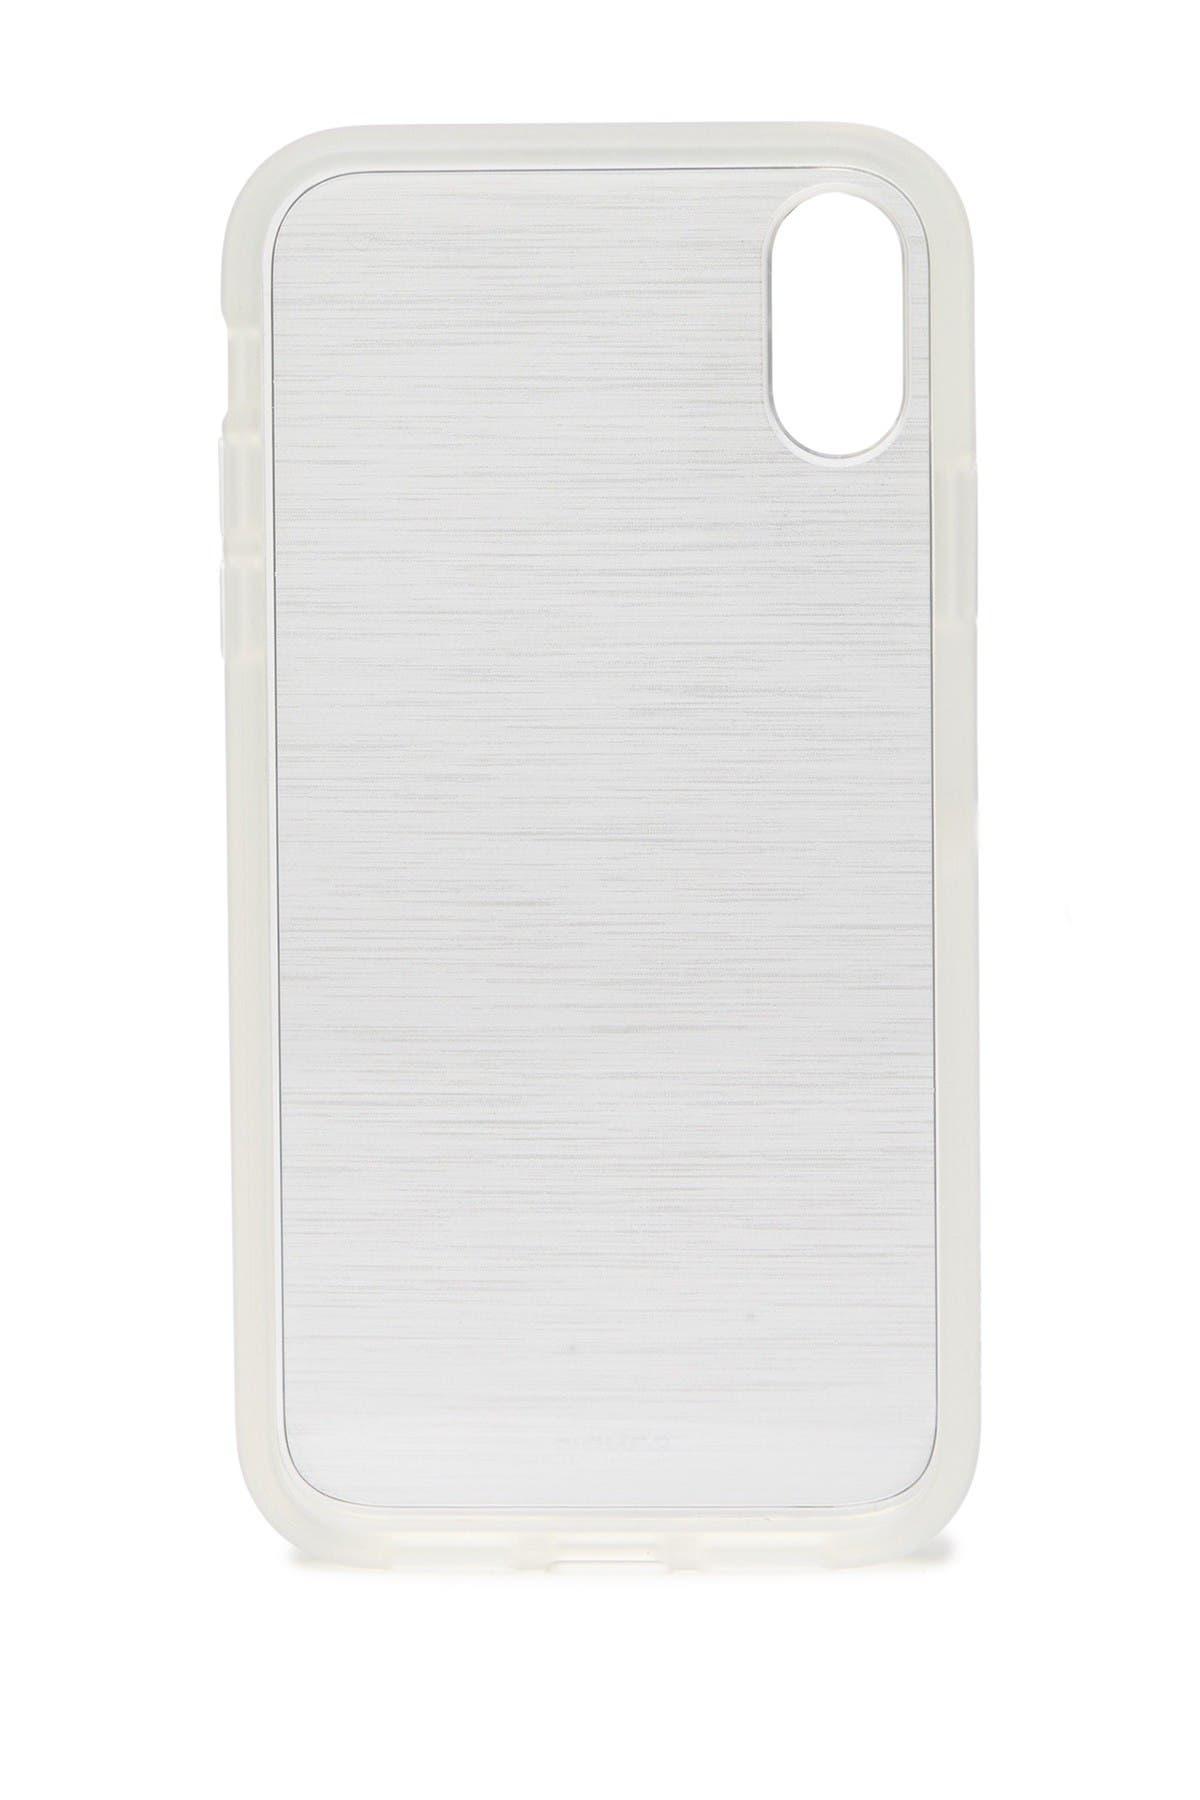 Image of BONDIR Clear Coat iPhone X Case